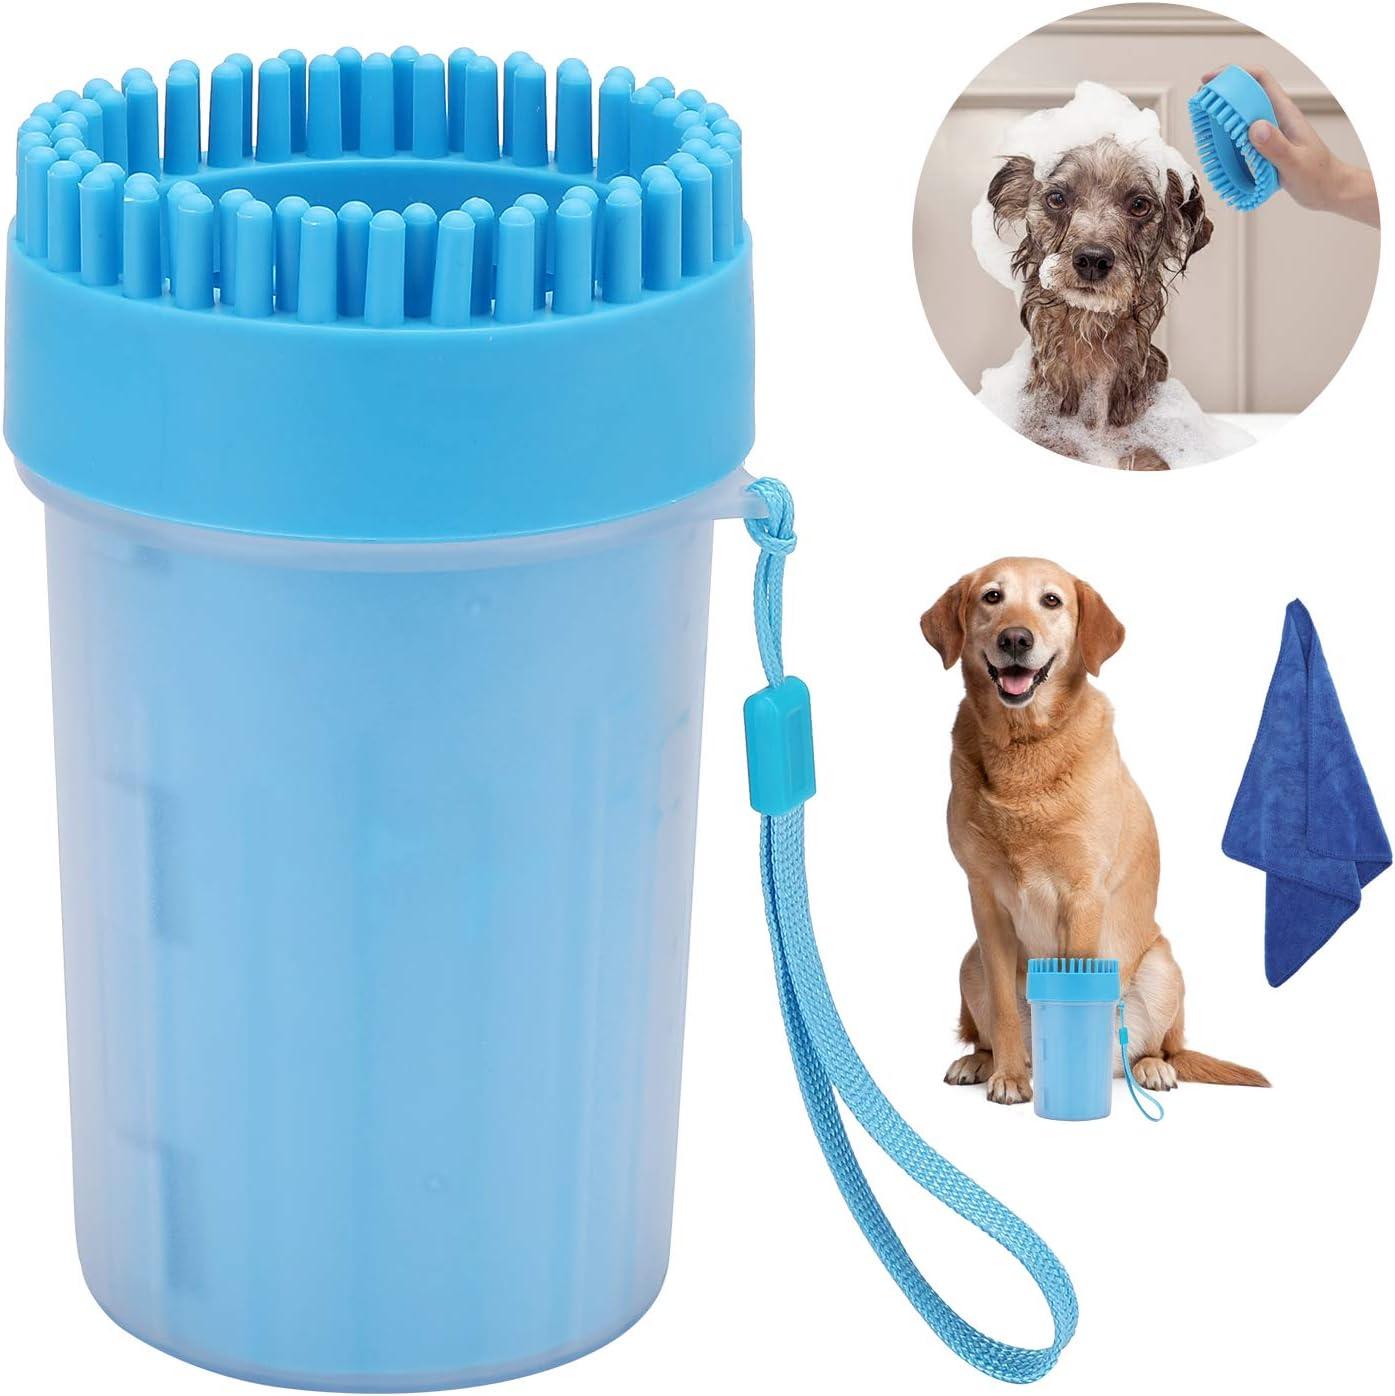 EKKONG Limpiador de Huellas de Perro, Lavadora de pies de Perro, Mascota portátil Limpiador con Toalla para Limpiar Pies Sucios de Mascotas (Azul)